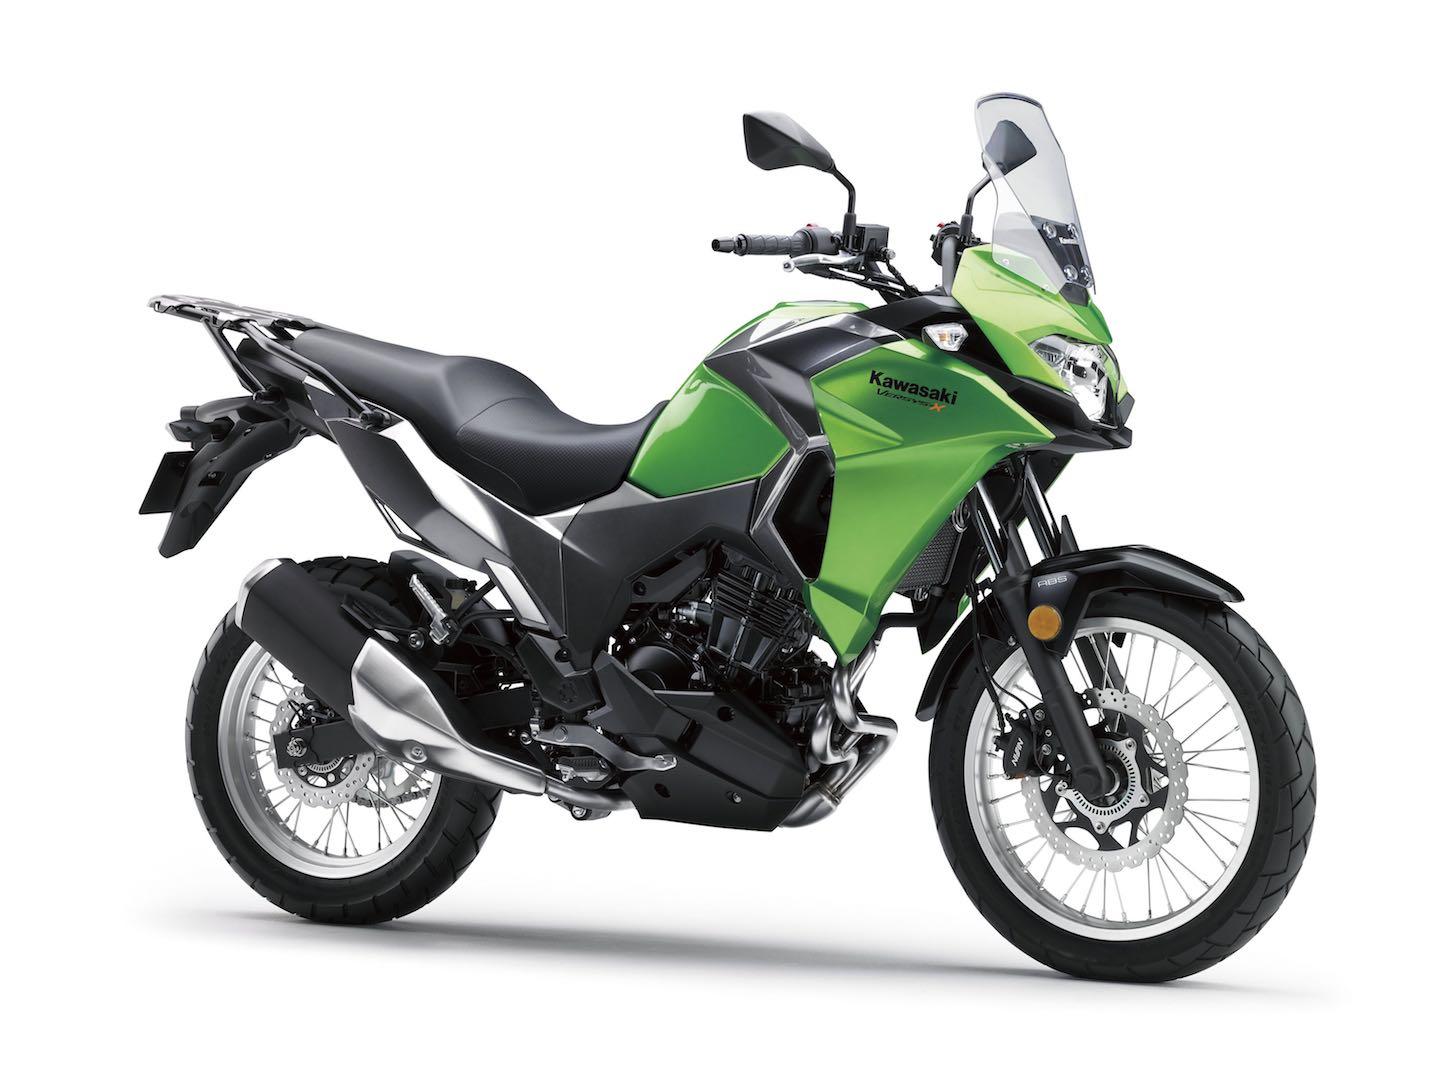 2017 Kawasaki Versys-X 300 First Look | 14 Fast Facts